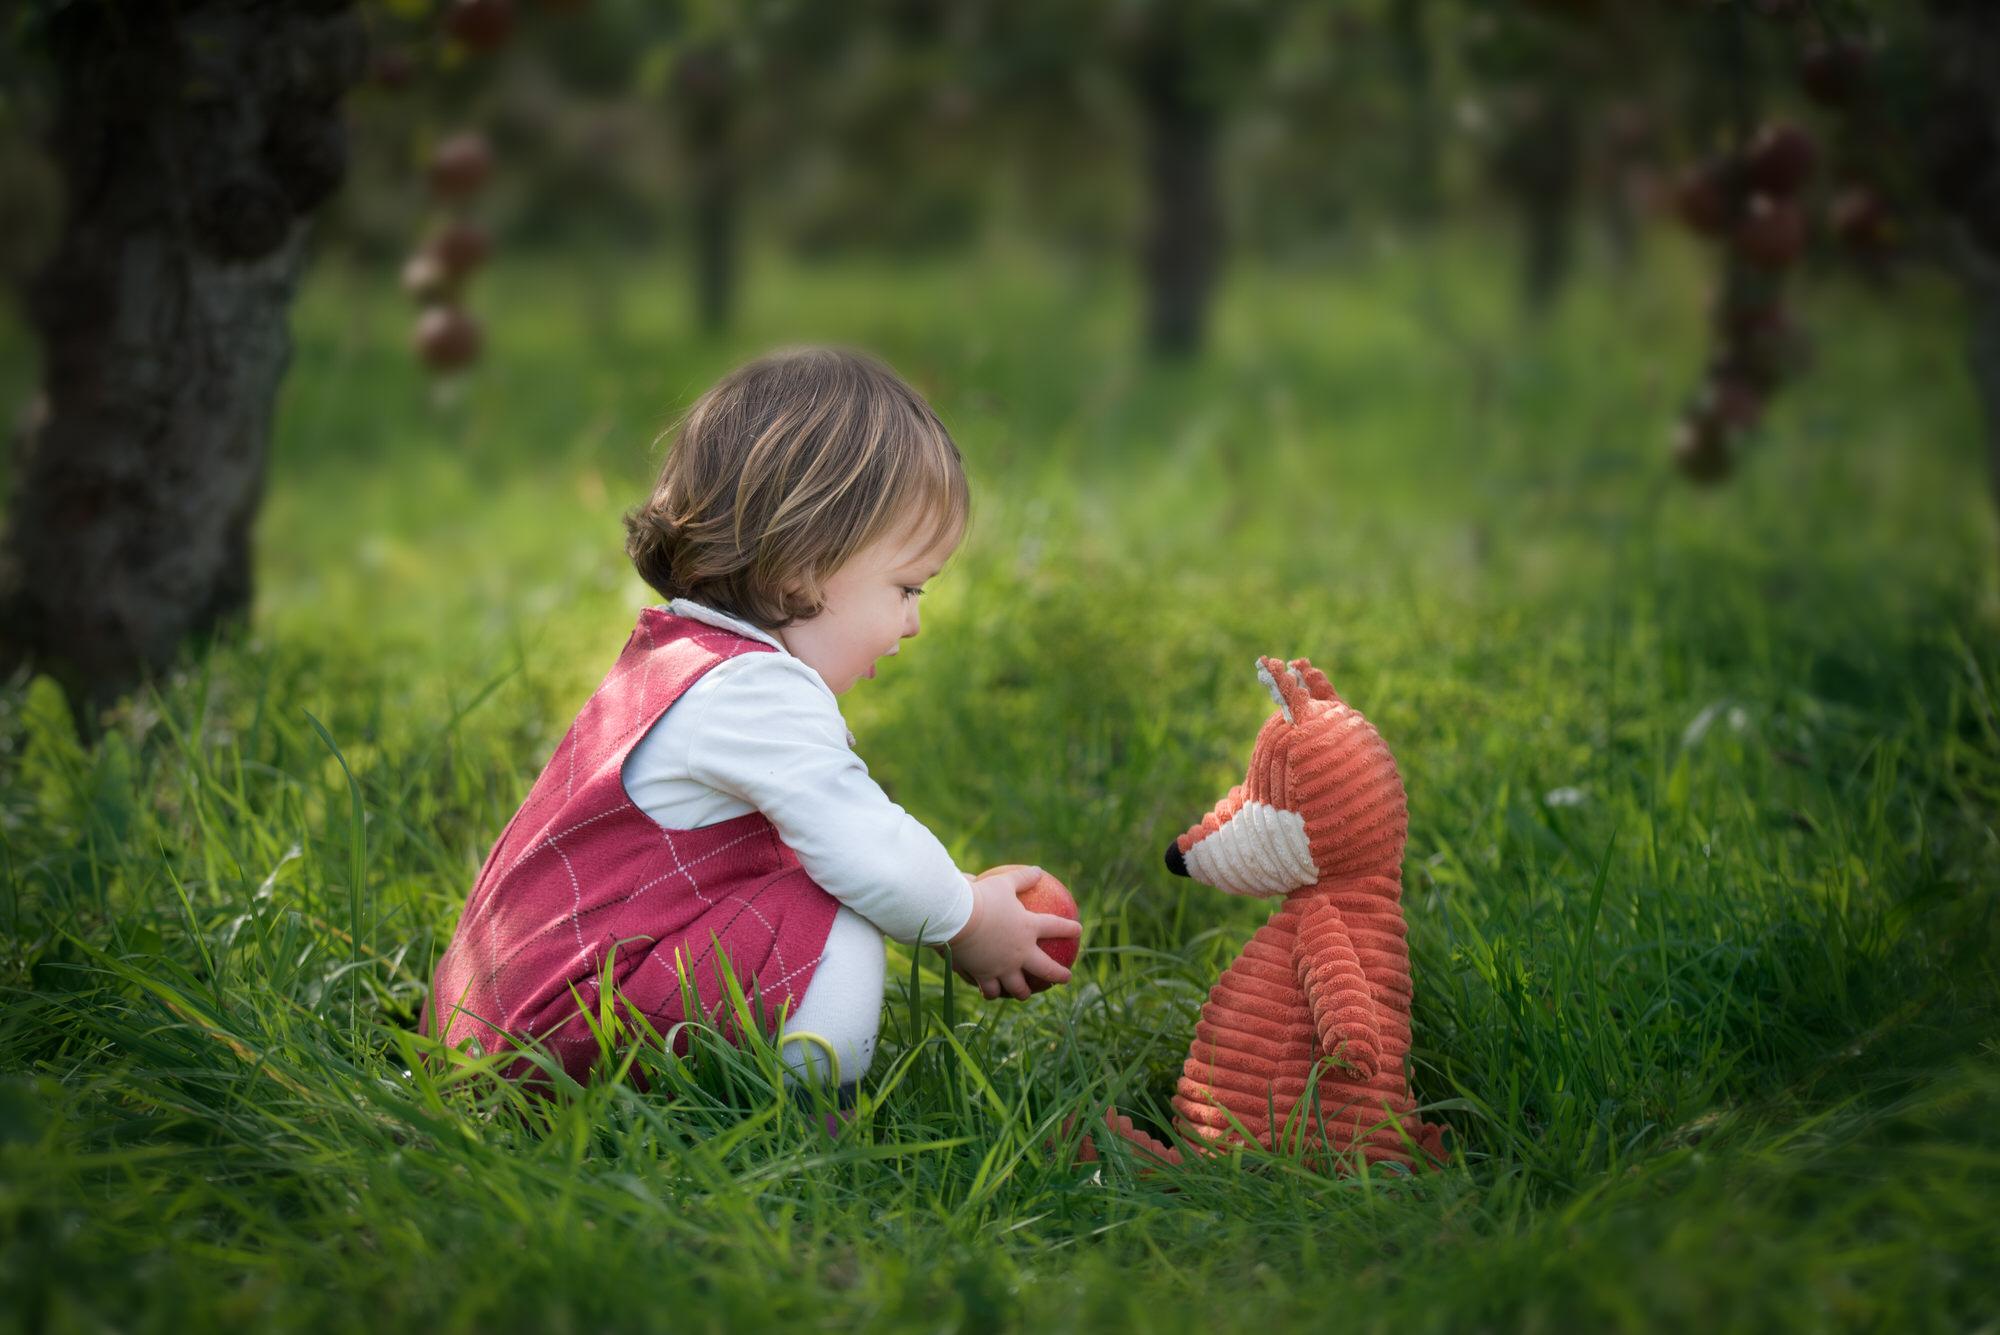 Toddler girl feeding apple to toy fox during photoshoot in Benson